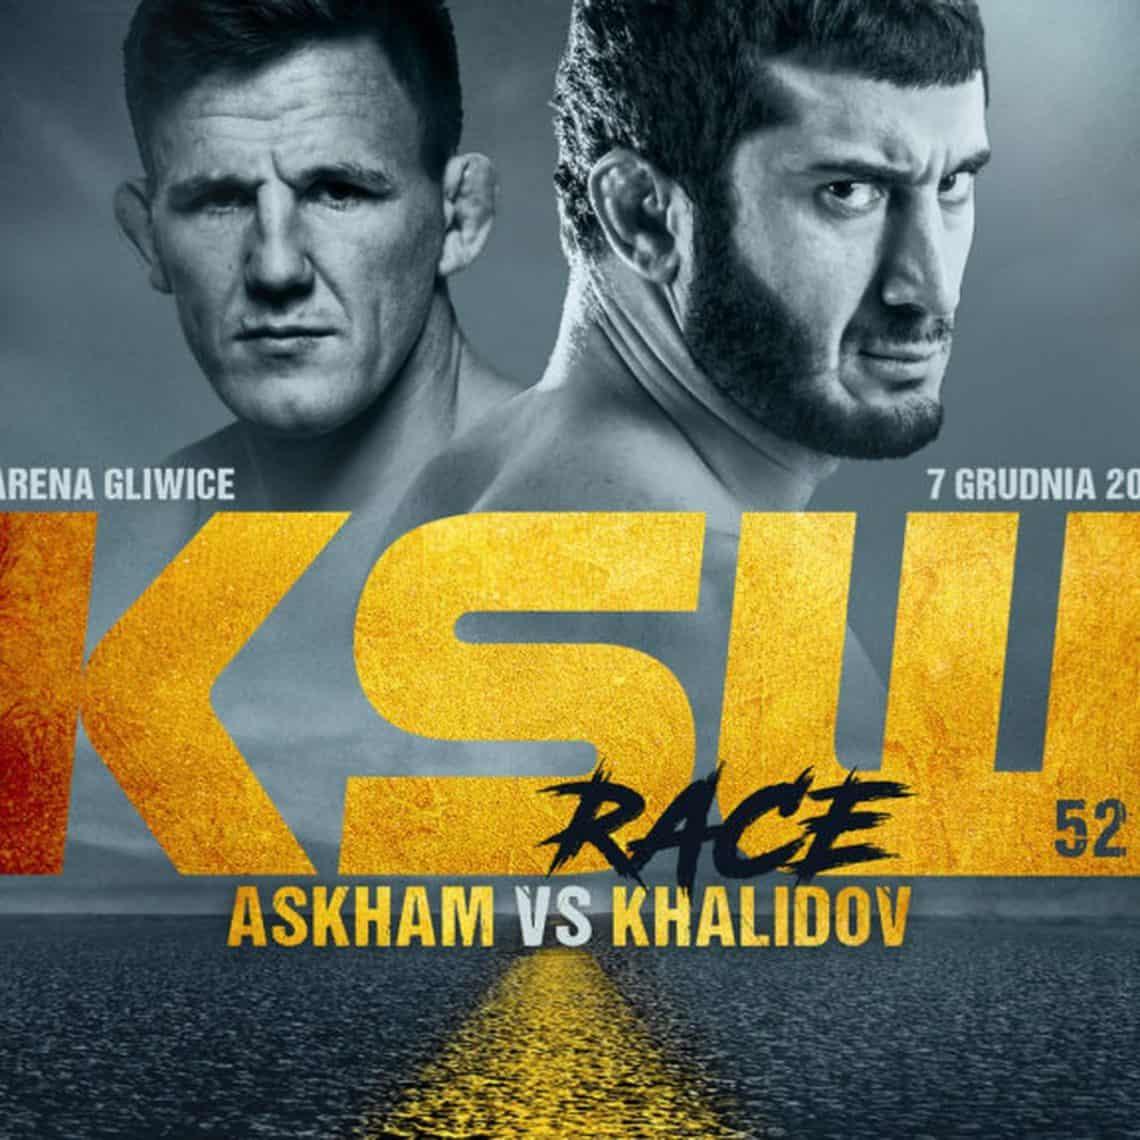 KSW 52: Askham vs Khalidov 1